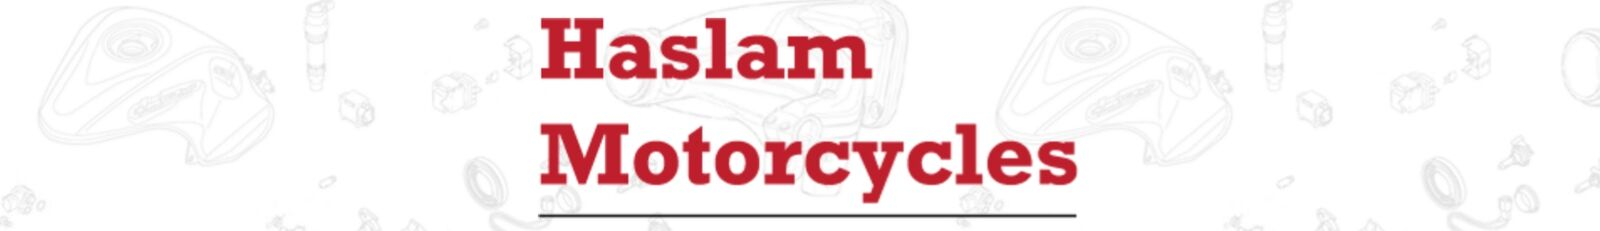 Haslam Motorcycles